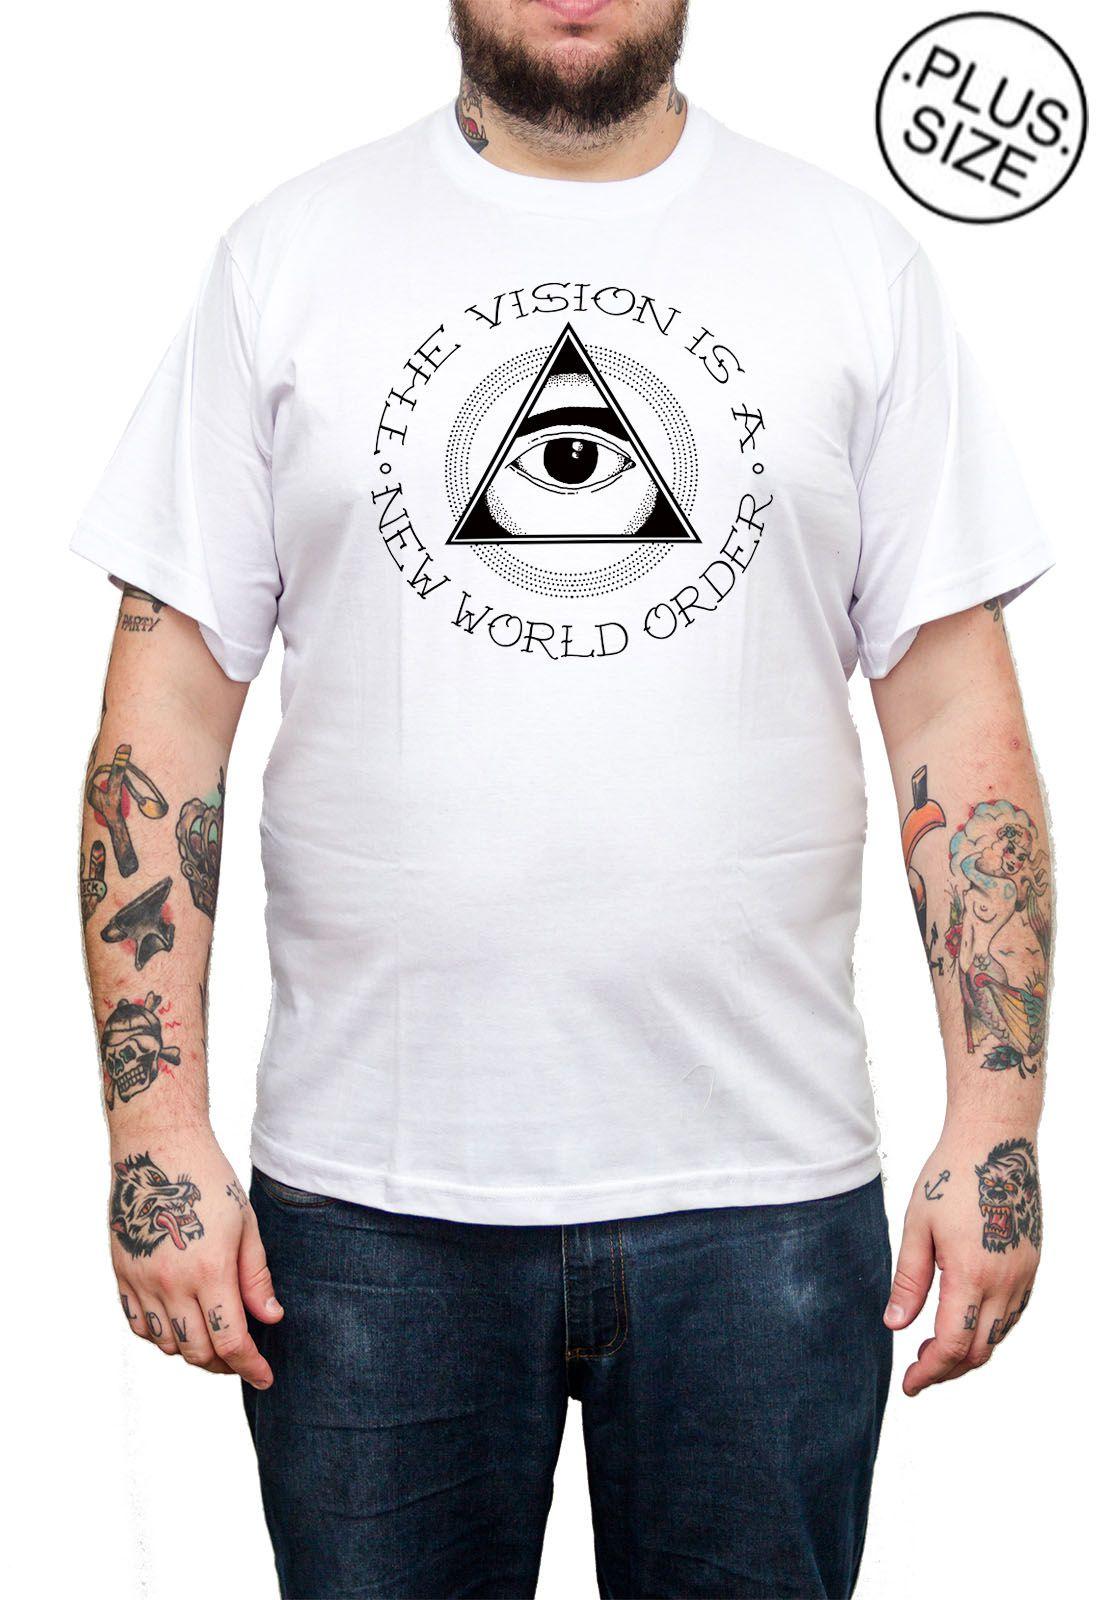 Camiseta Hshop Vision - Branco - Plus Size - Tamanho Grande XG  - HShop